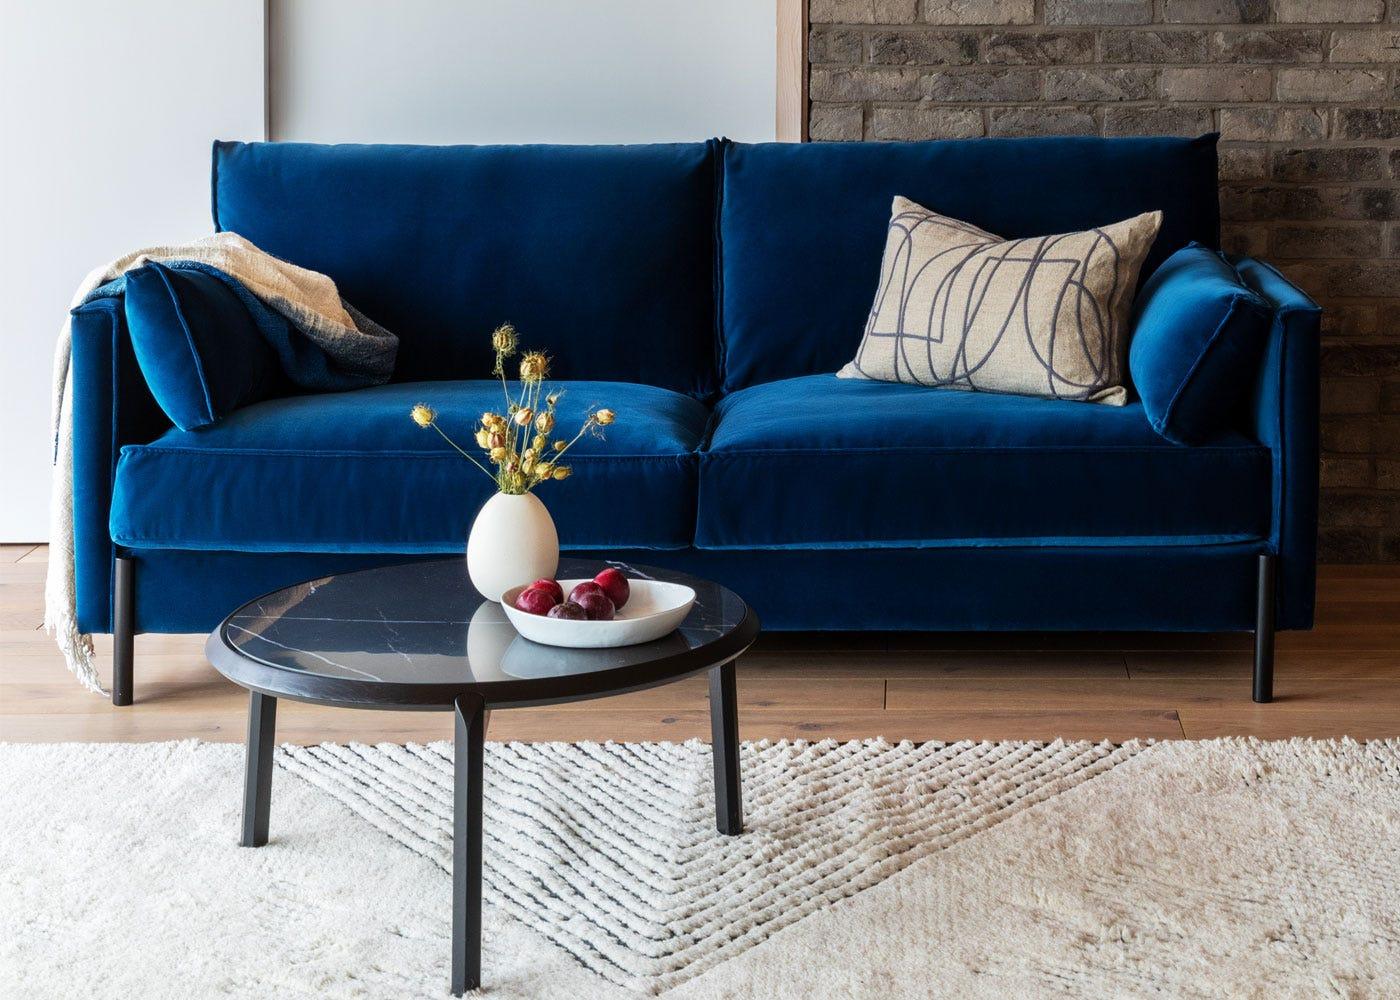 Tortona sofa, Notch coffee table